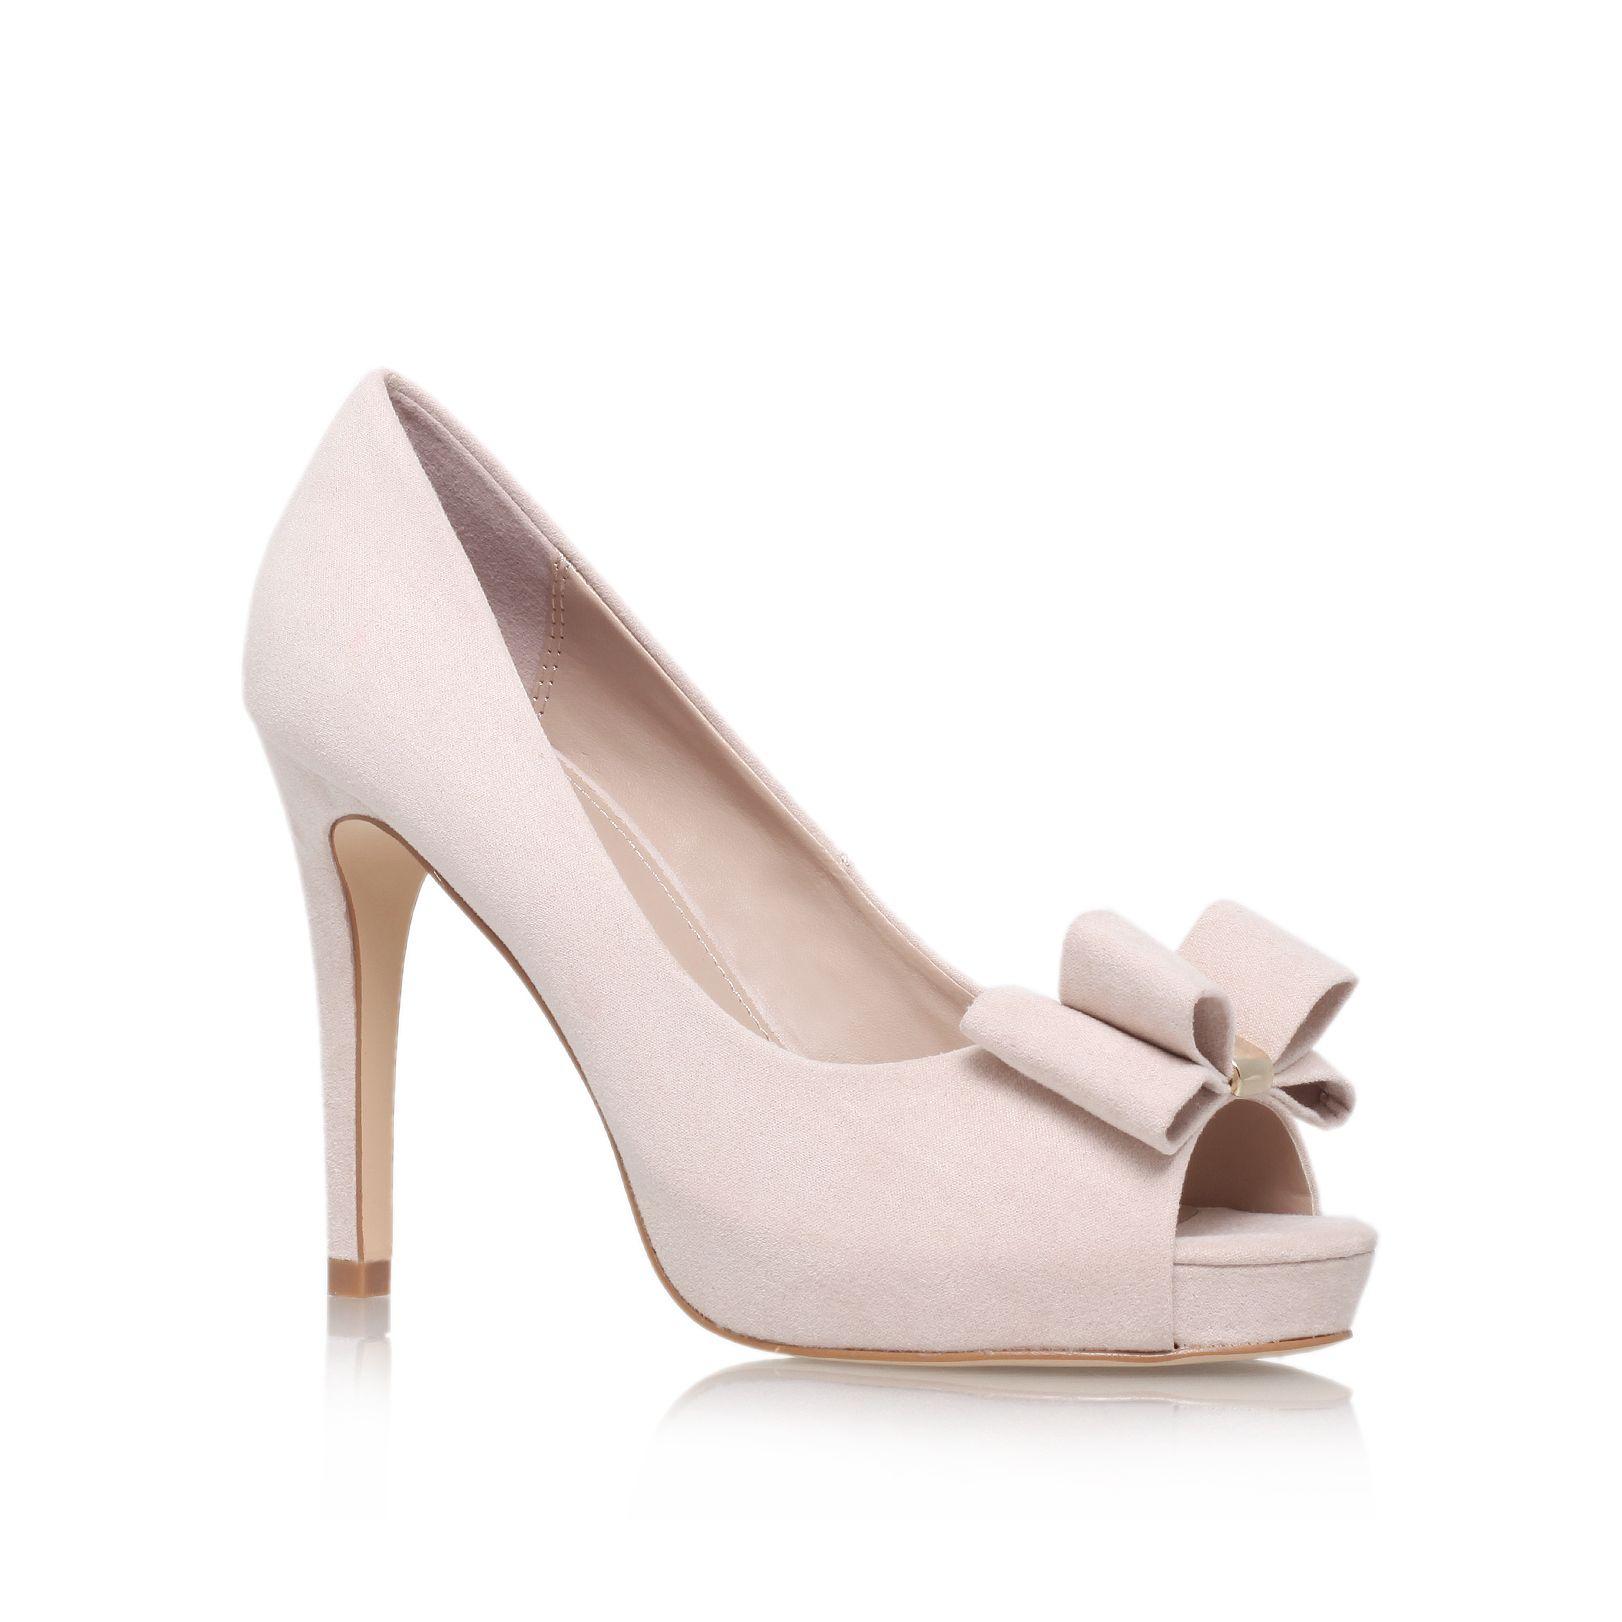 miss kg carolina high heel peep toe court shoes in